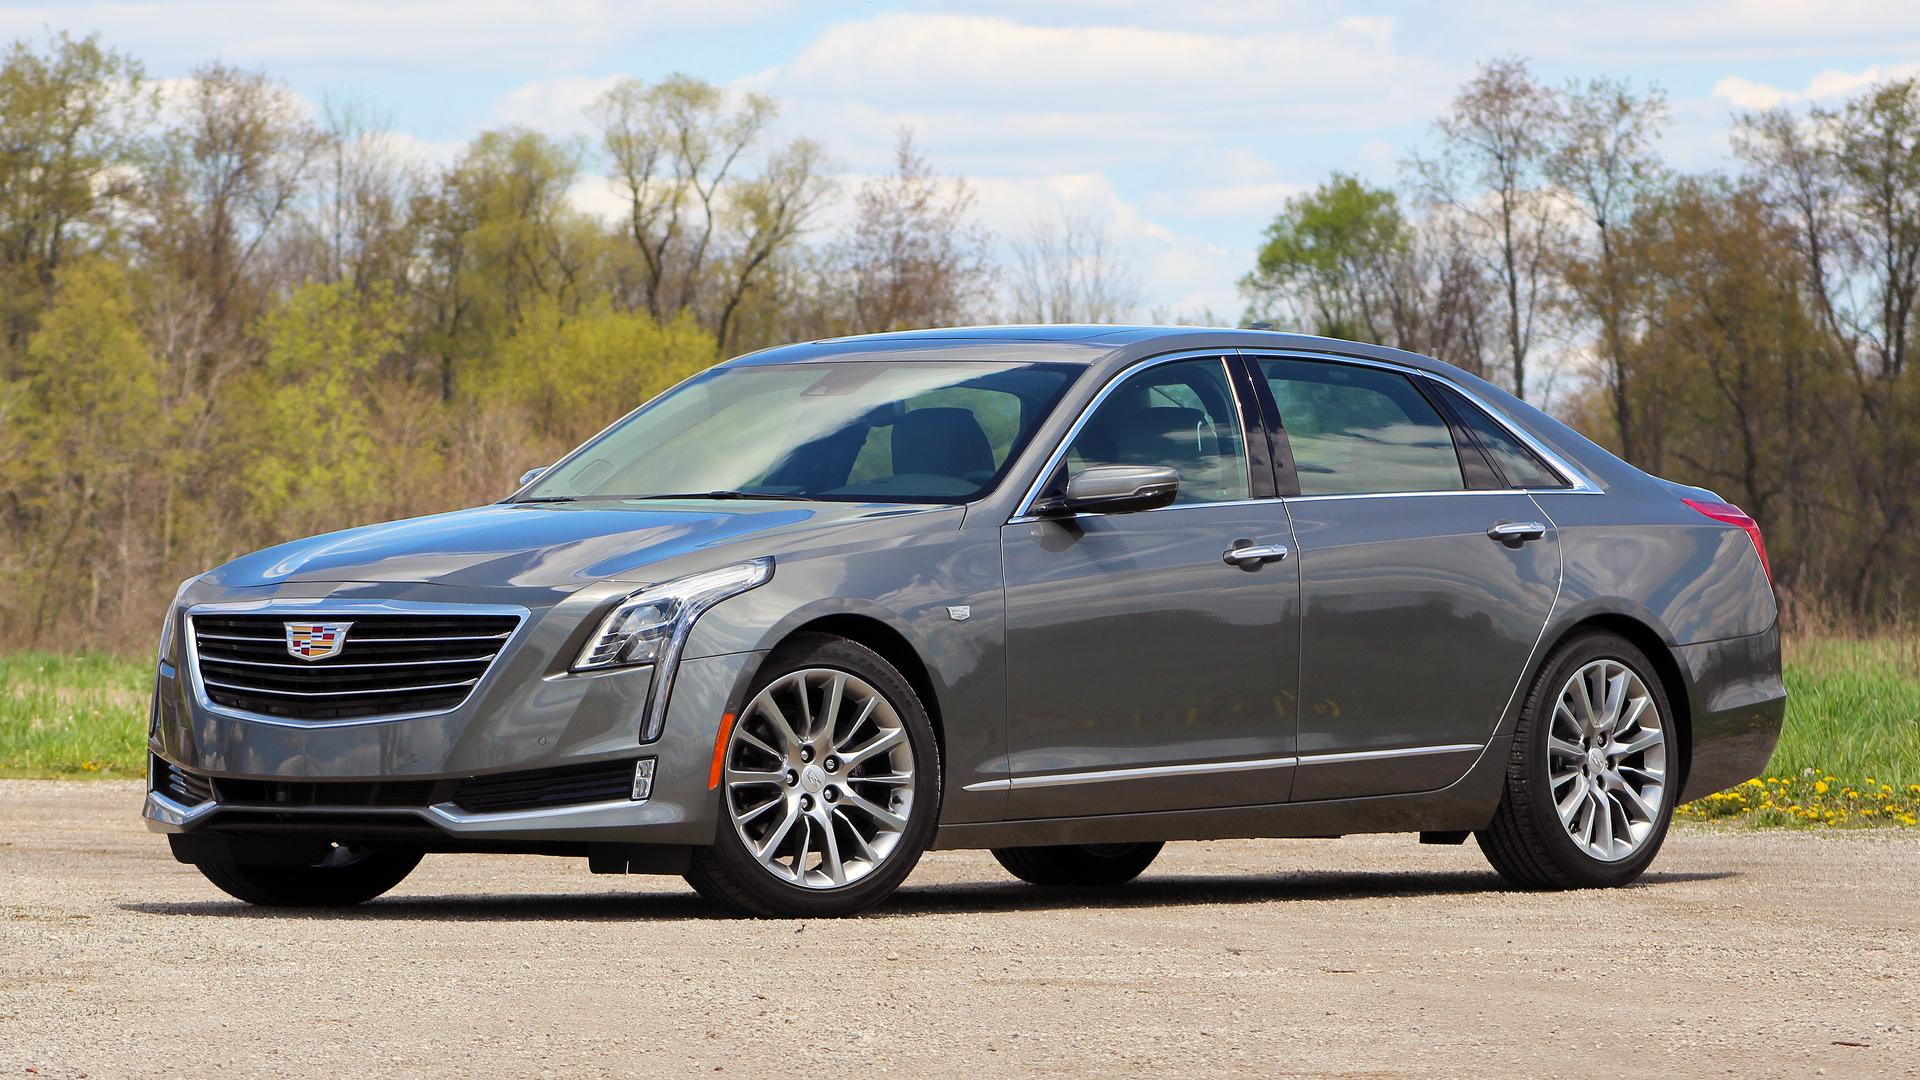 First Drive 2016 Cadillac Ct6 Motor1 Com